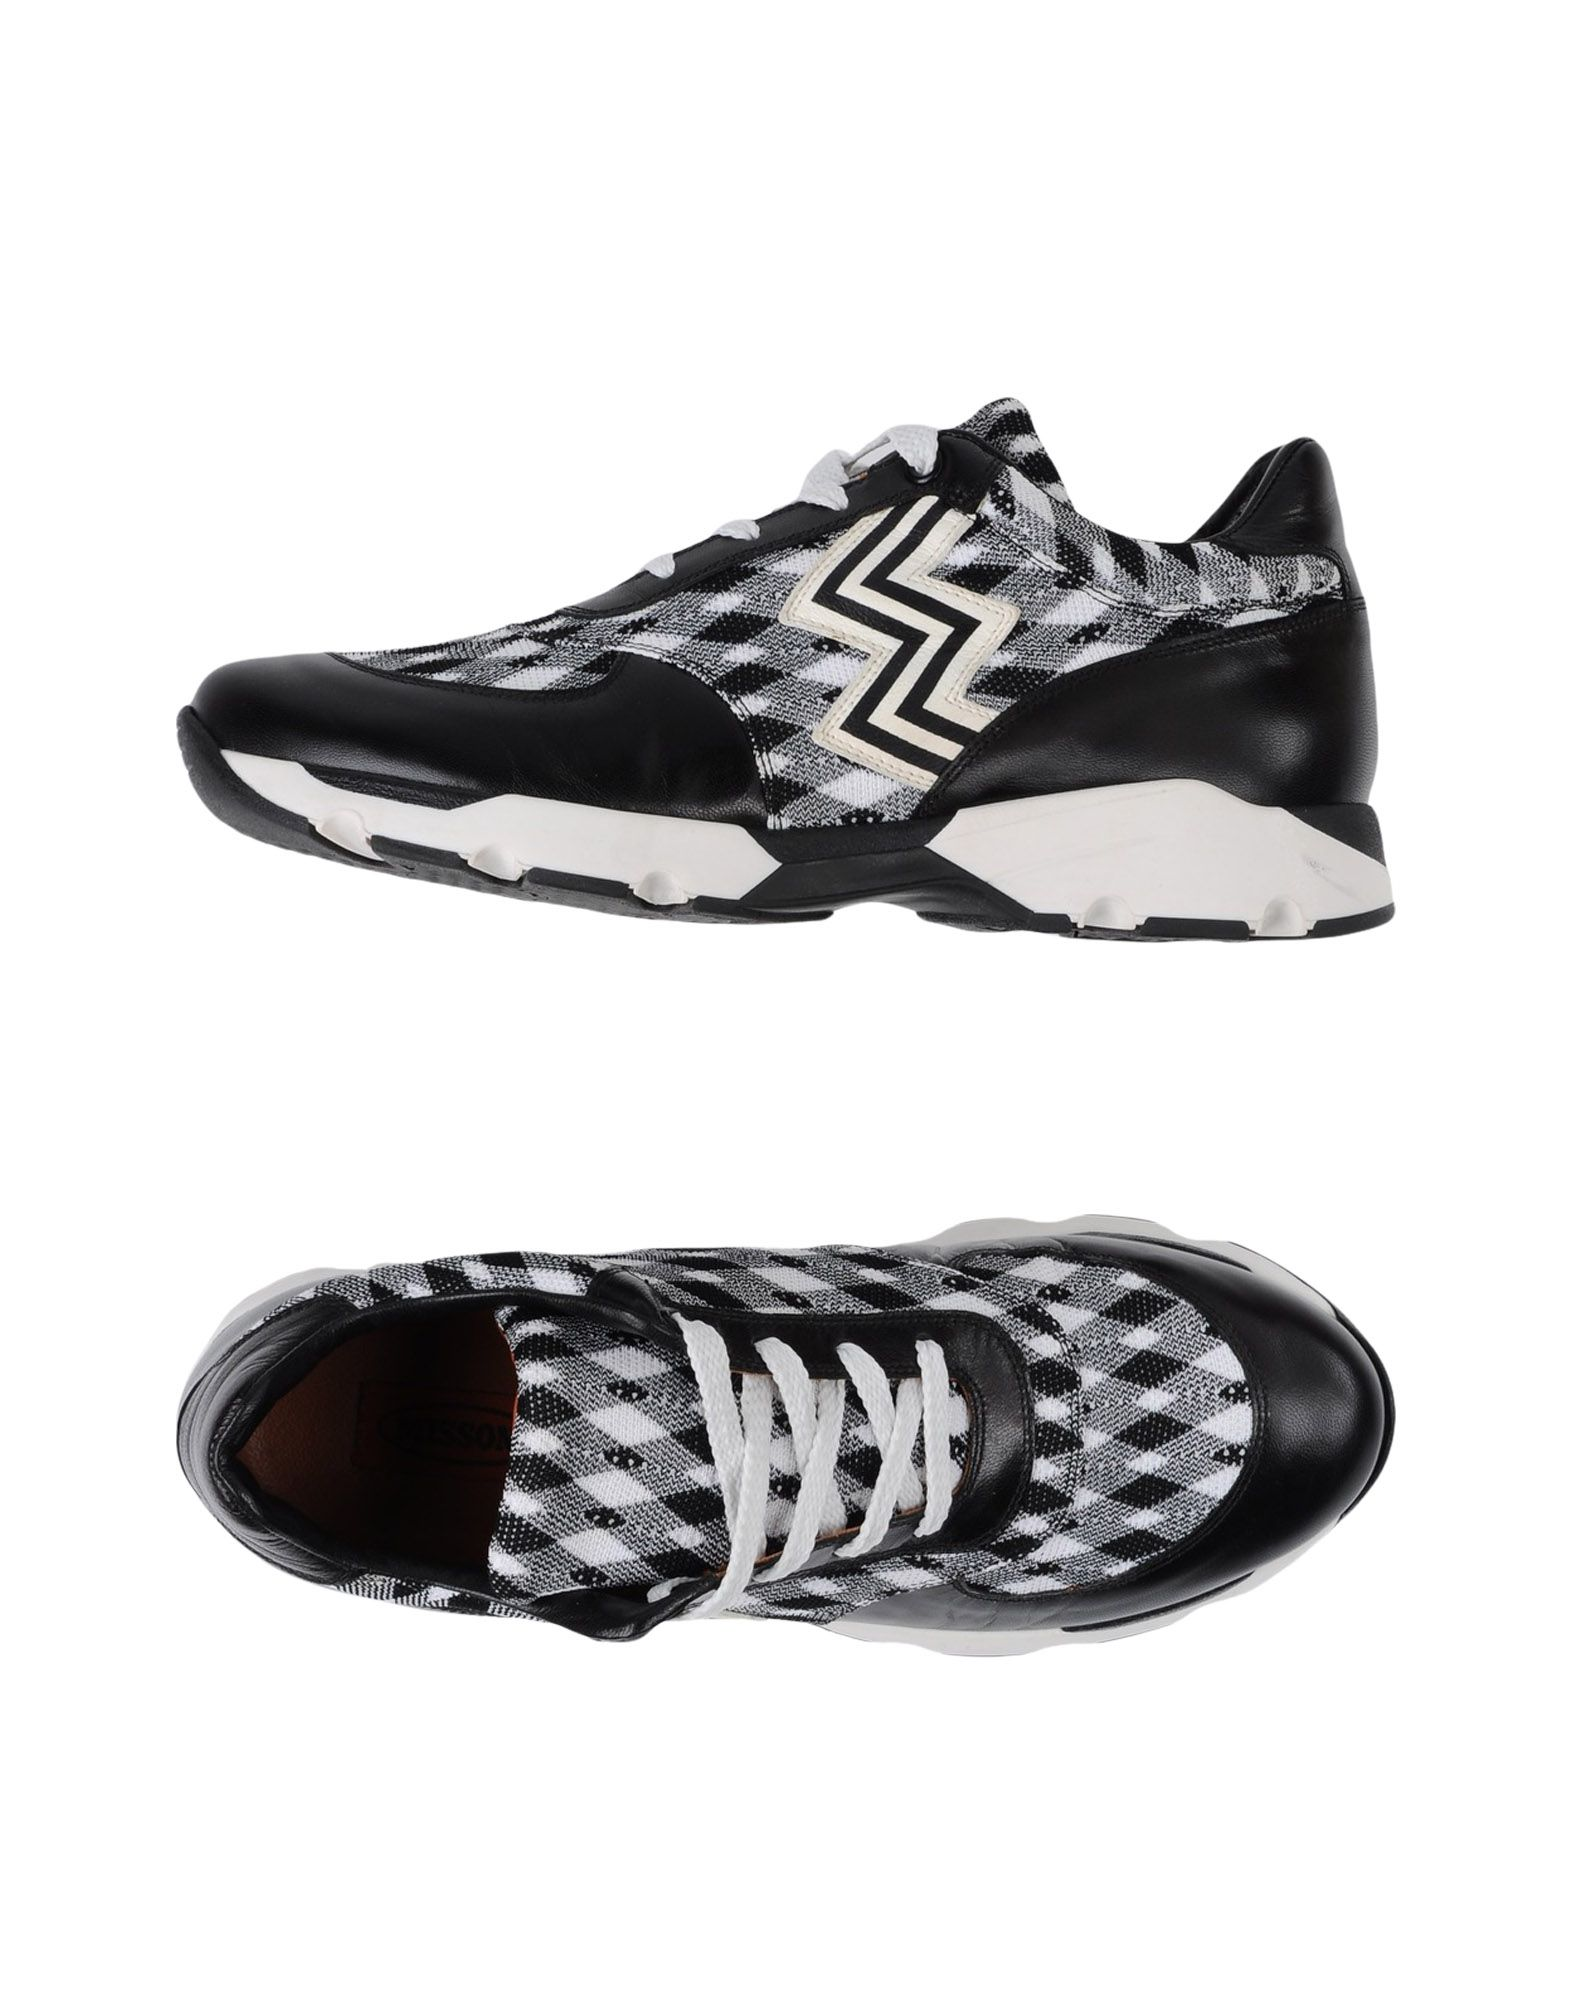 Missoni Sneakers Damen  11339886QVGut aussehende strapazierfähige Schuhe